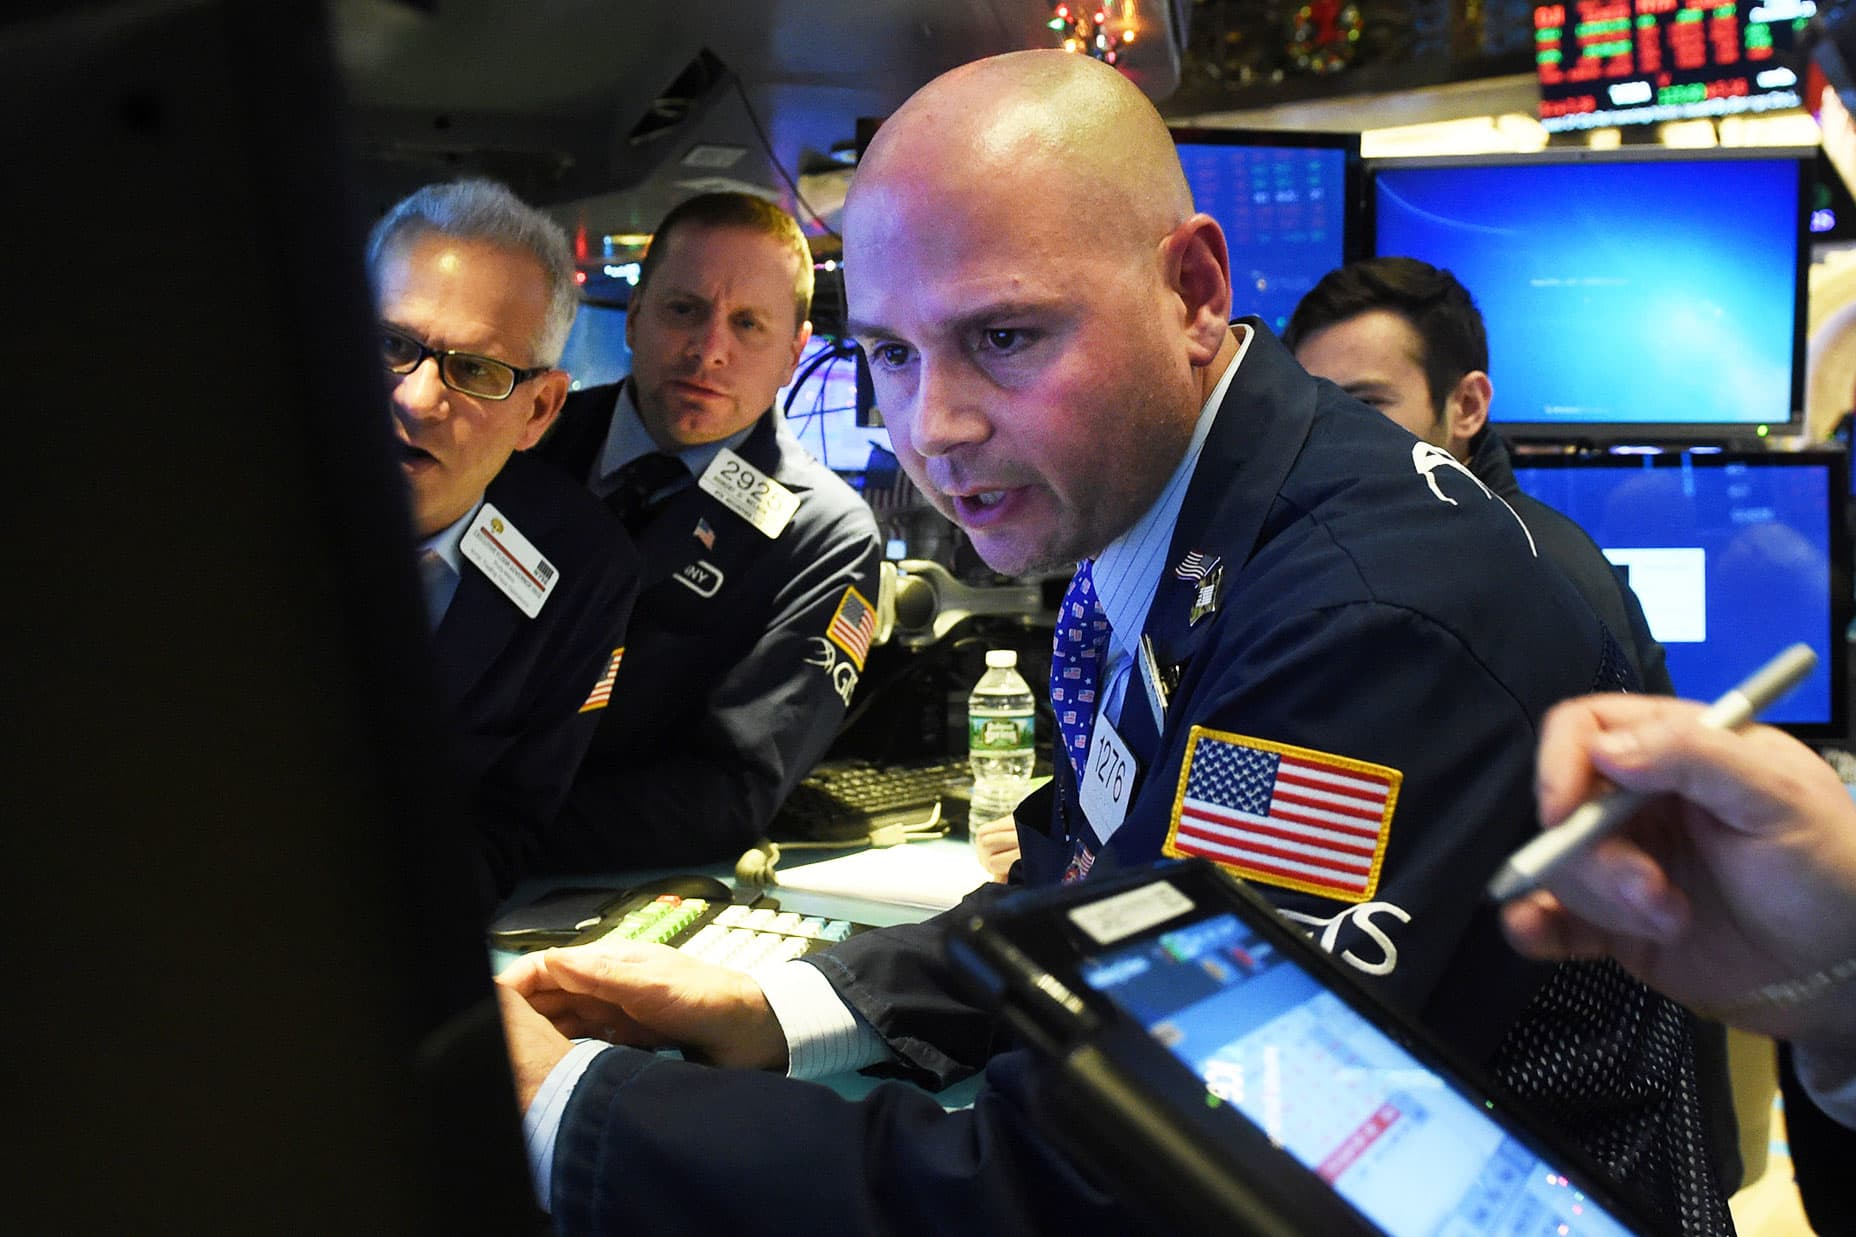 Stocks making the biggest moves premarket: Boeing, Tesla, CBS, Amazon, Marriott & more